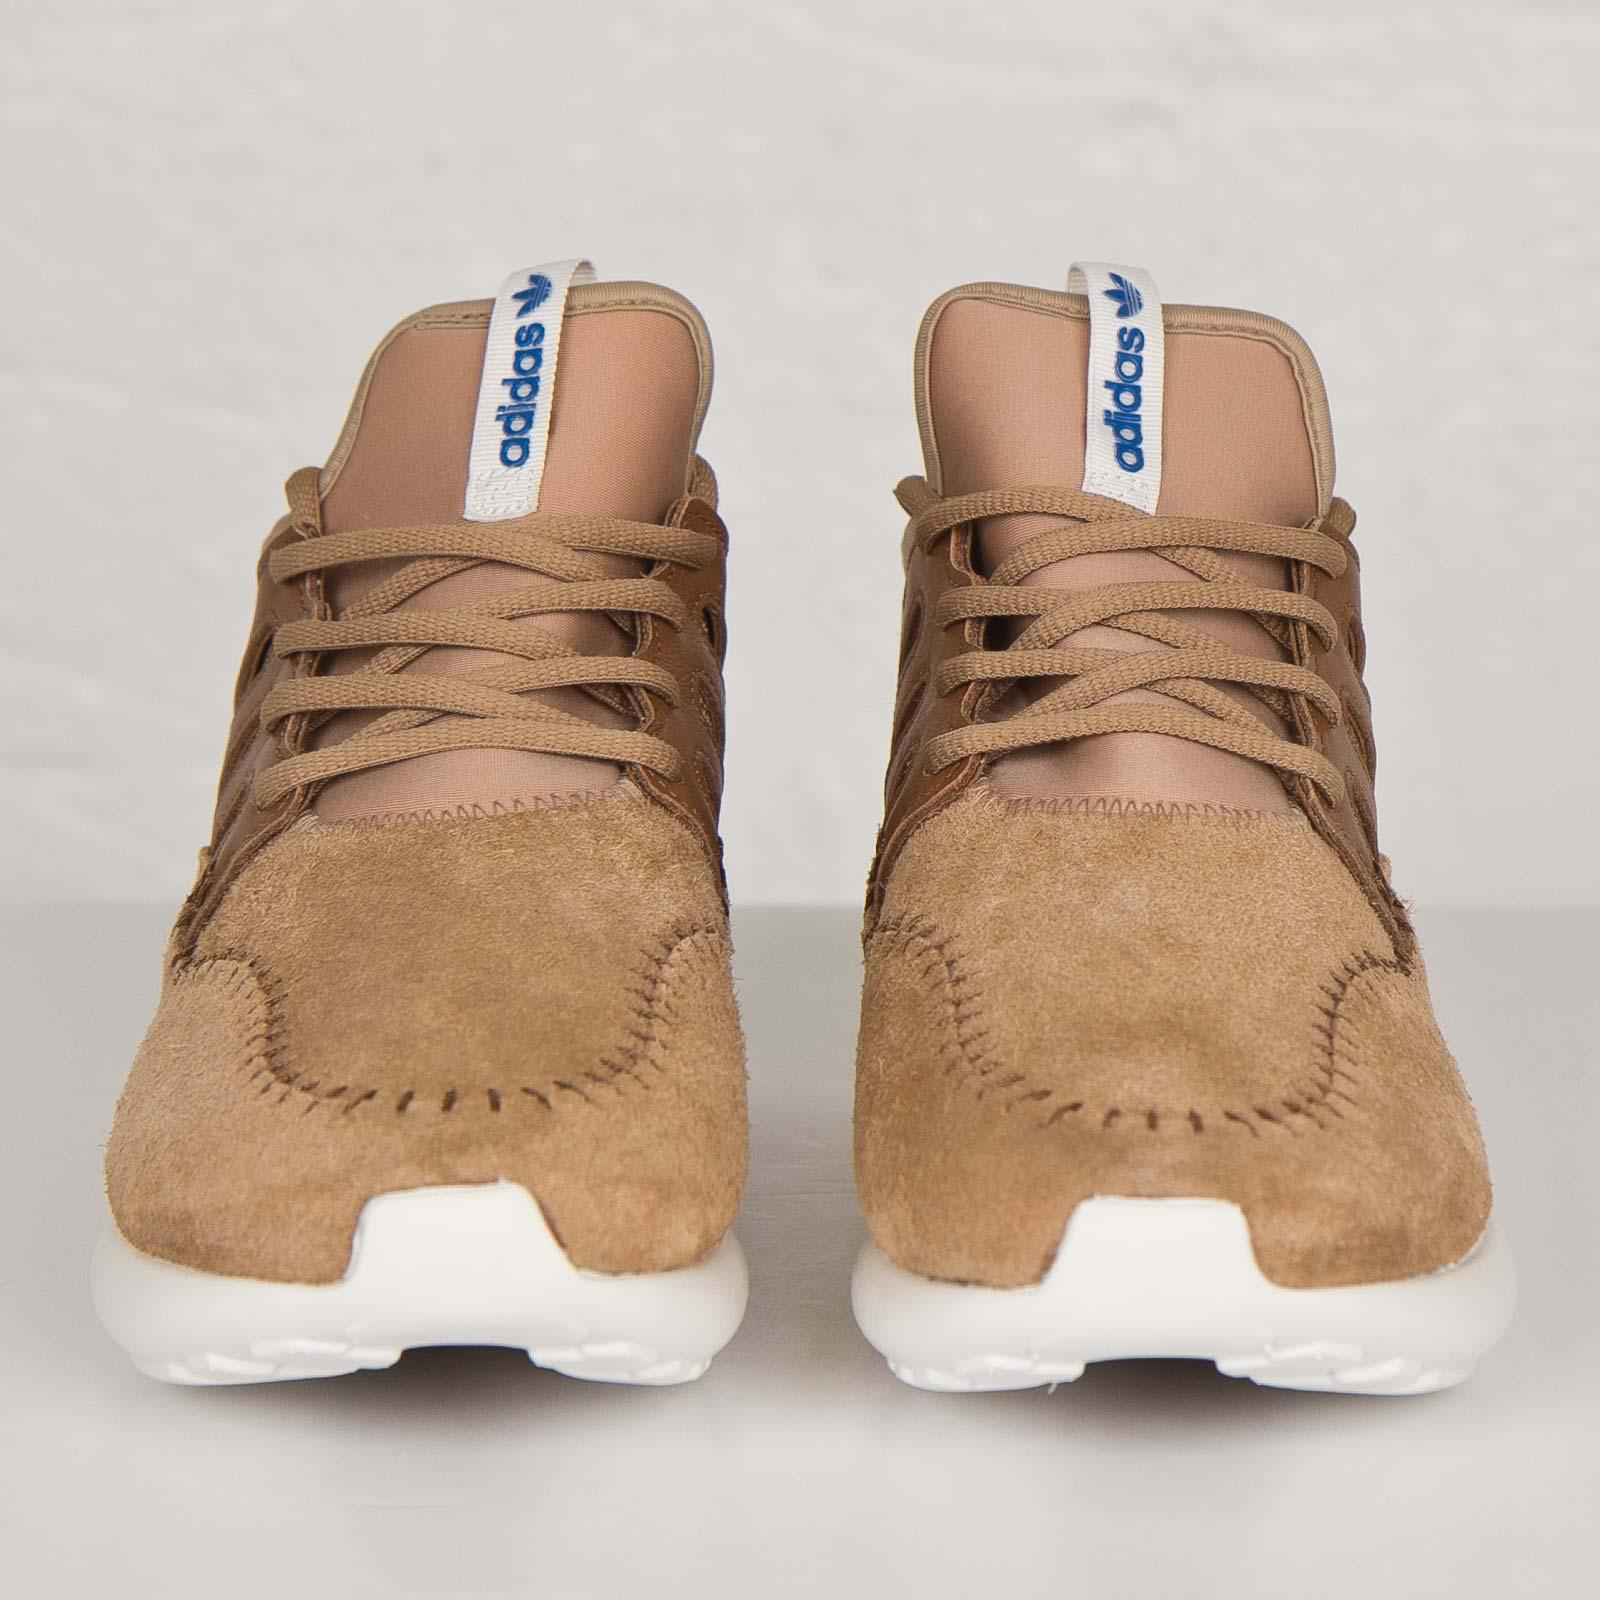 20307f359817 adidas Tubular Moc Runner - B25786 - Sneakersnstuff